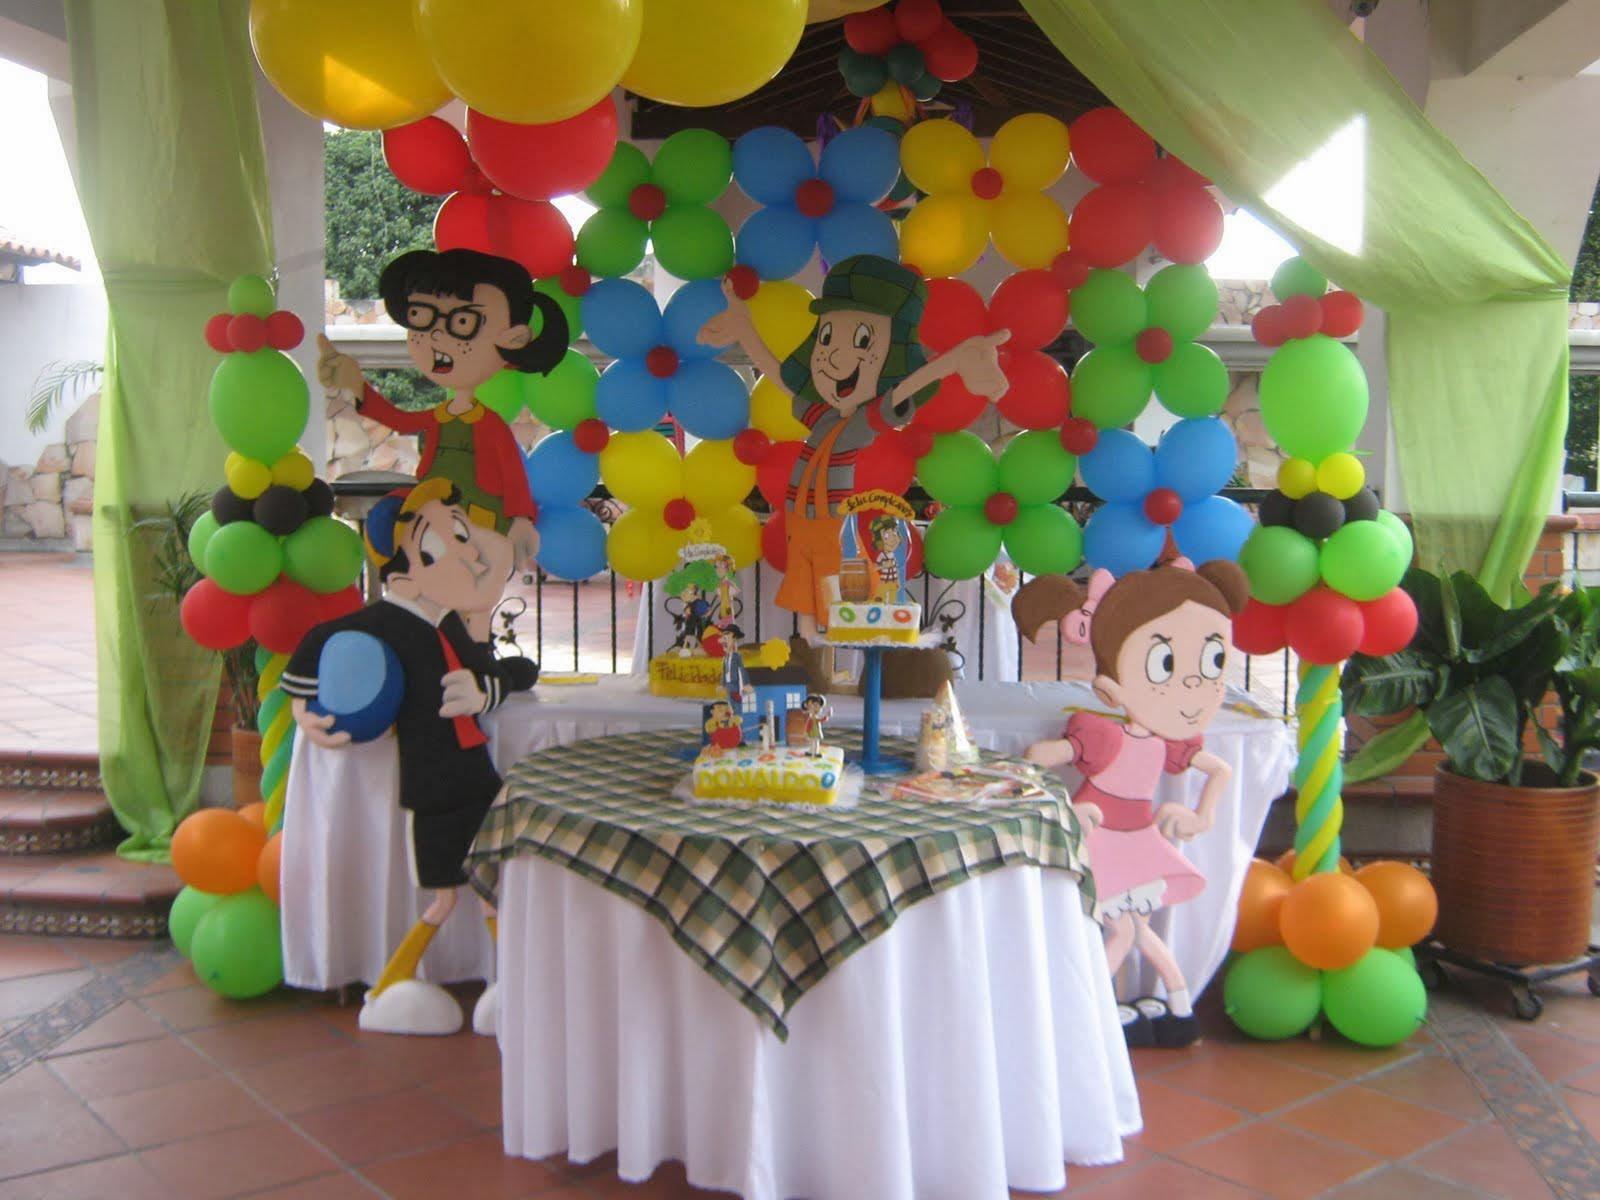 Ideas apara ahorrar al organizar fiesta infantil - Organizar cumpleanos ninos ...